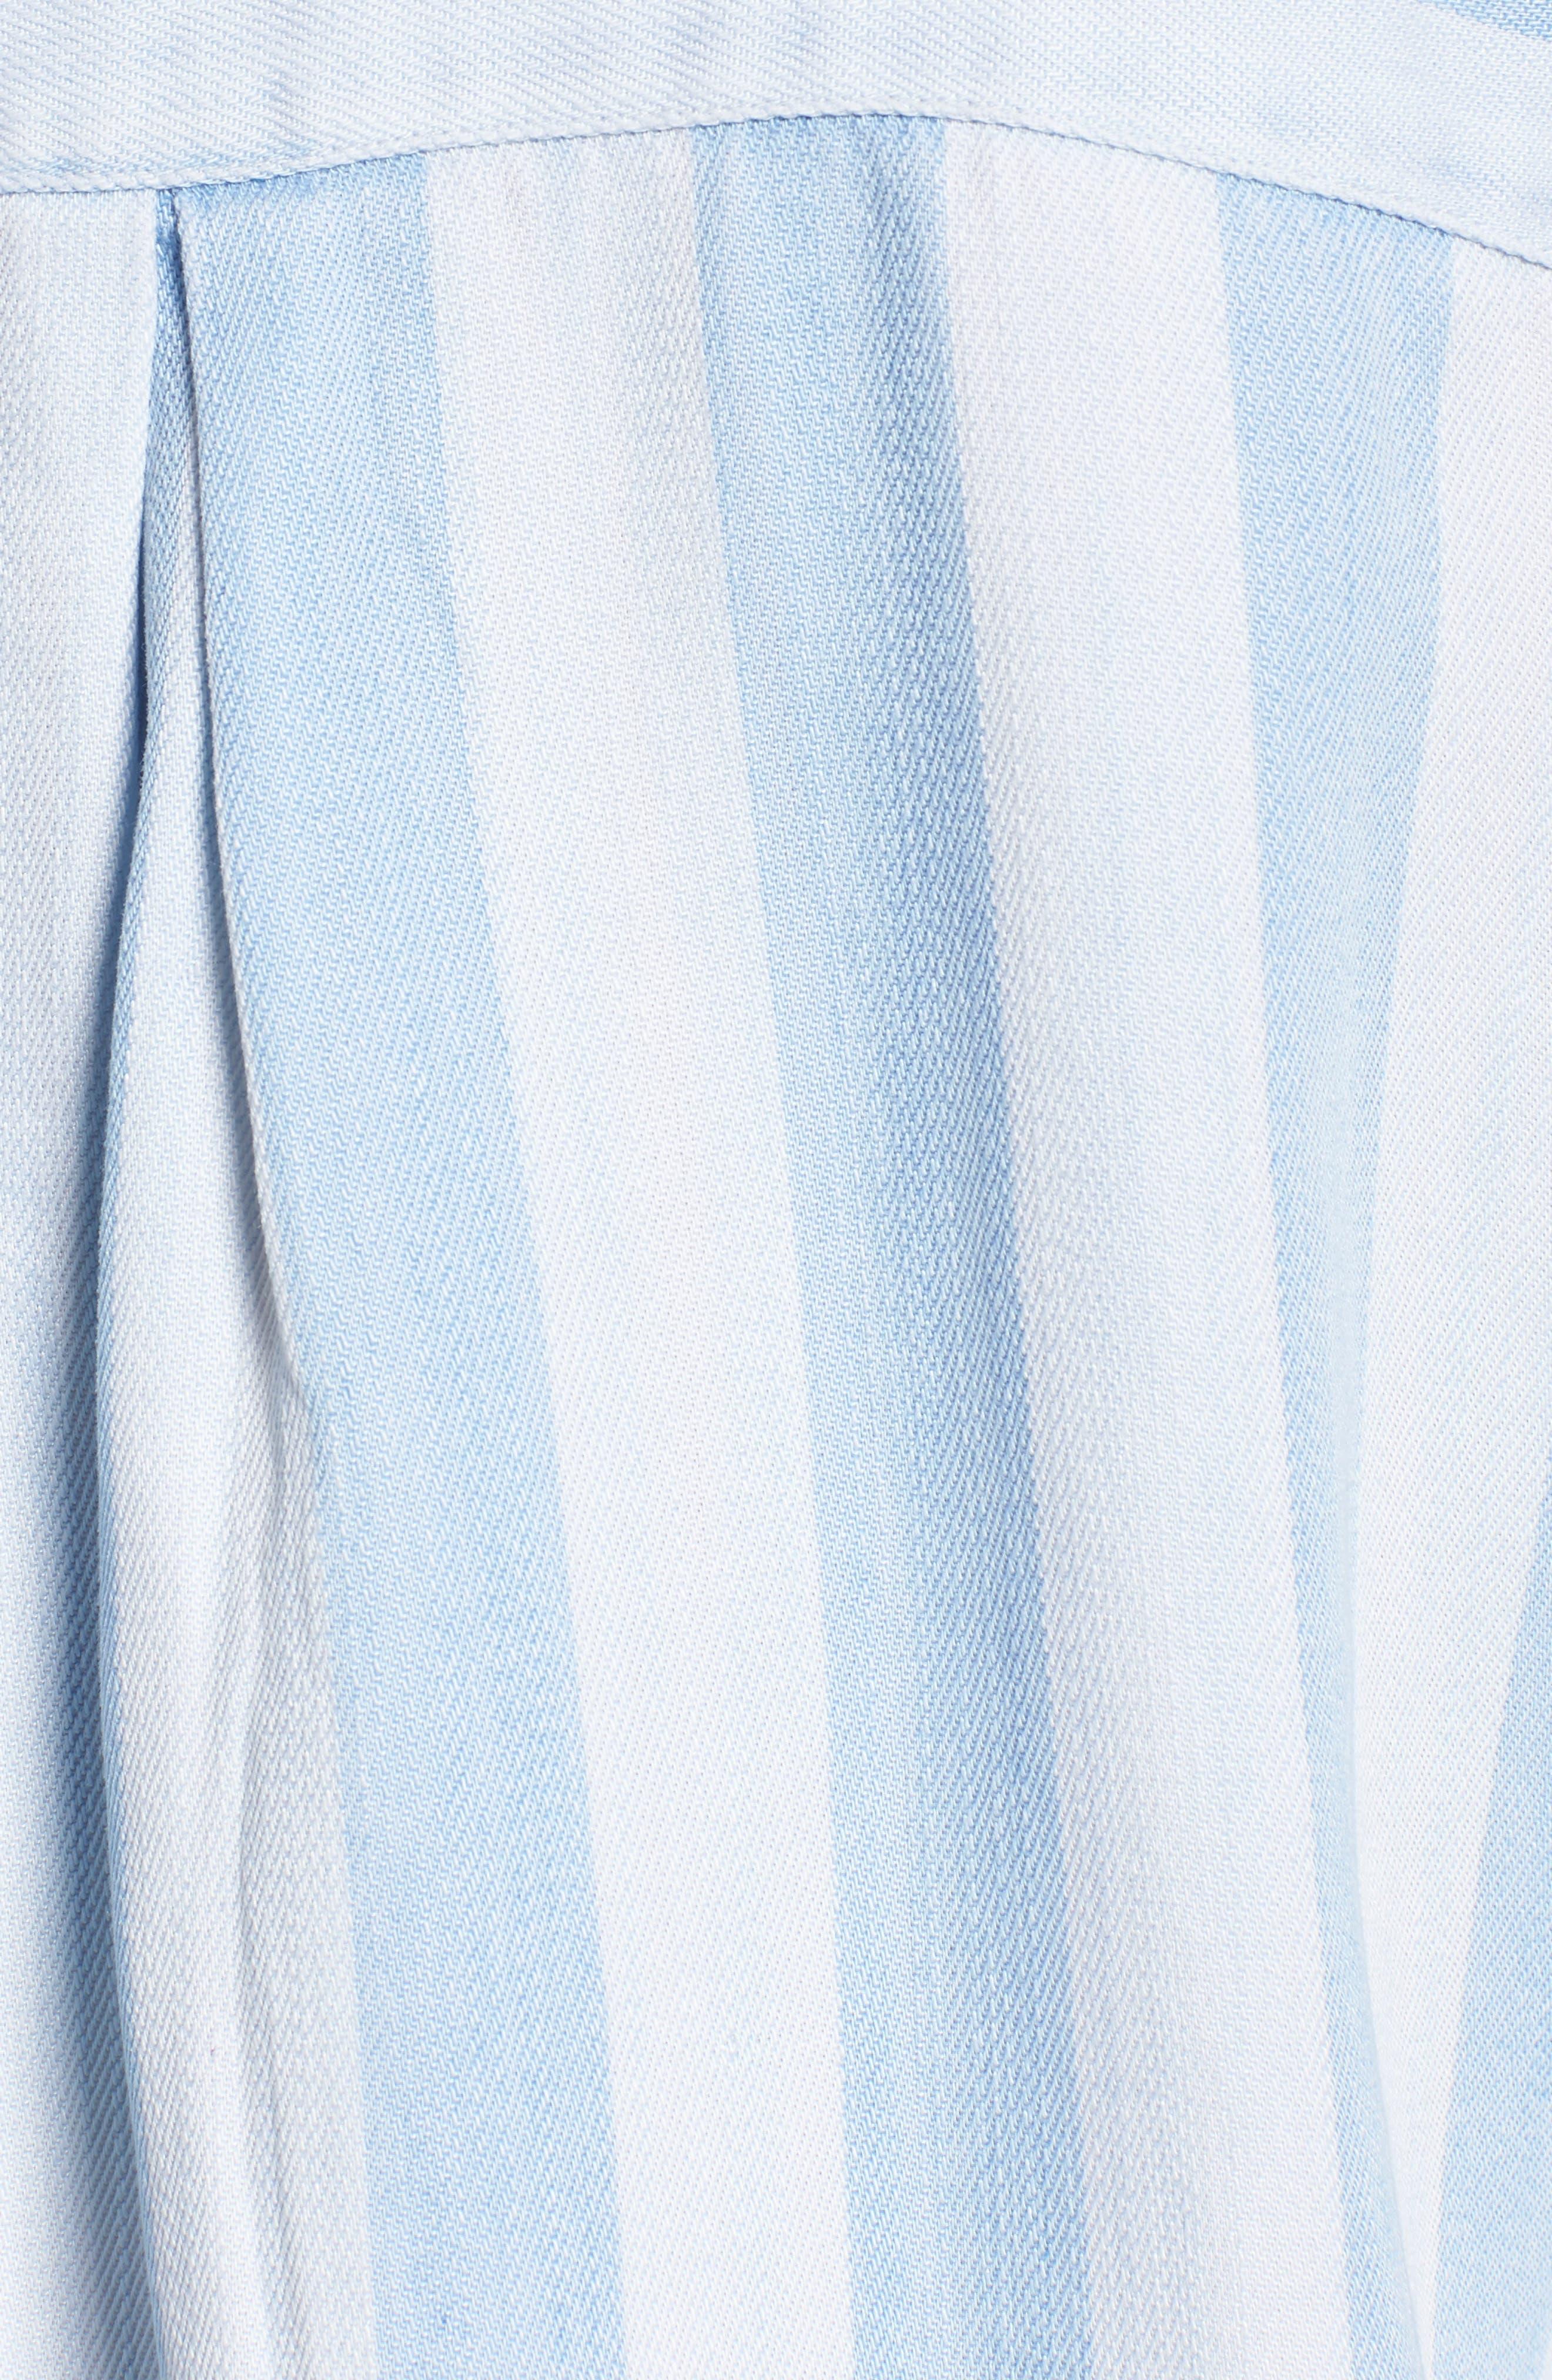 RAILS,                             Bishop Distressed Stripe Blouse,                             Alternate thumbnail 5, color,                             458